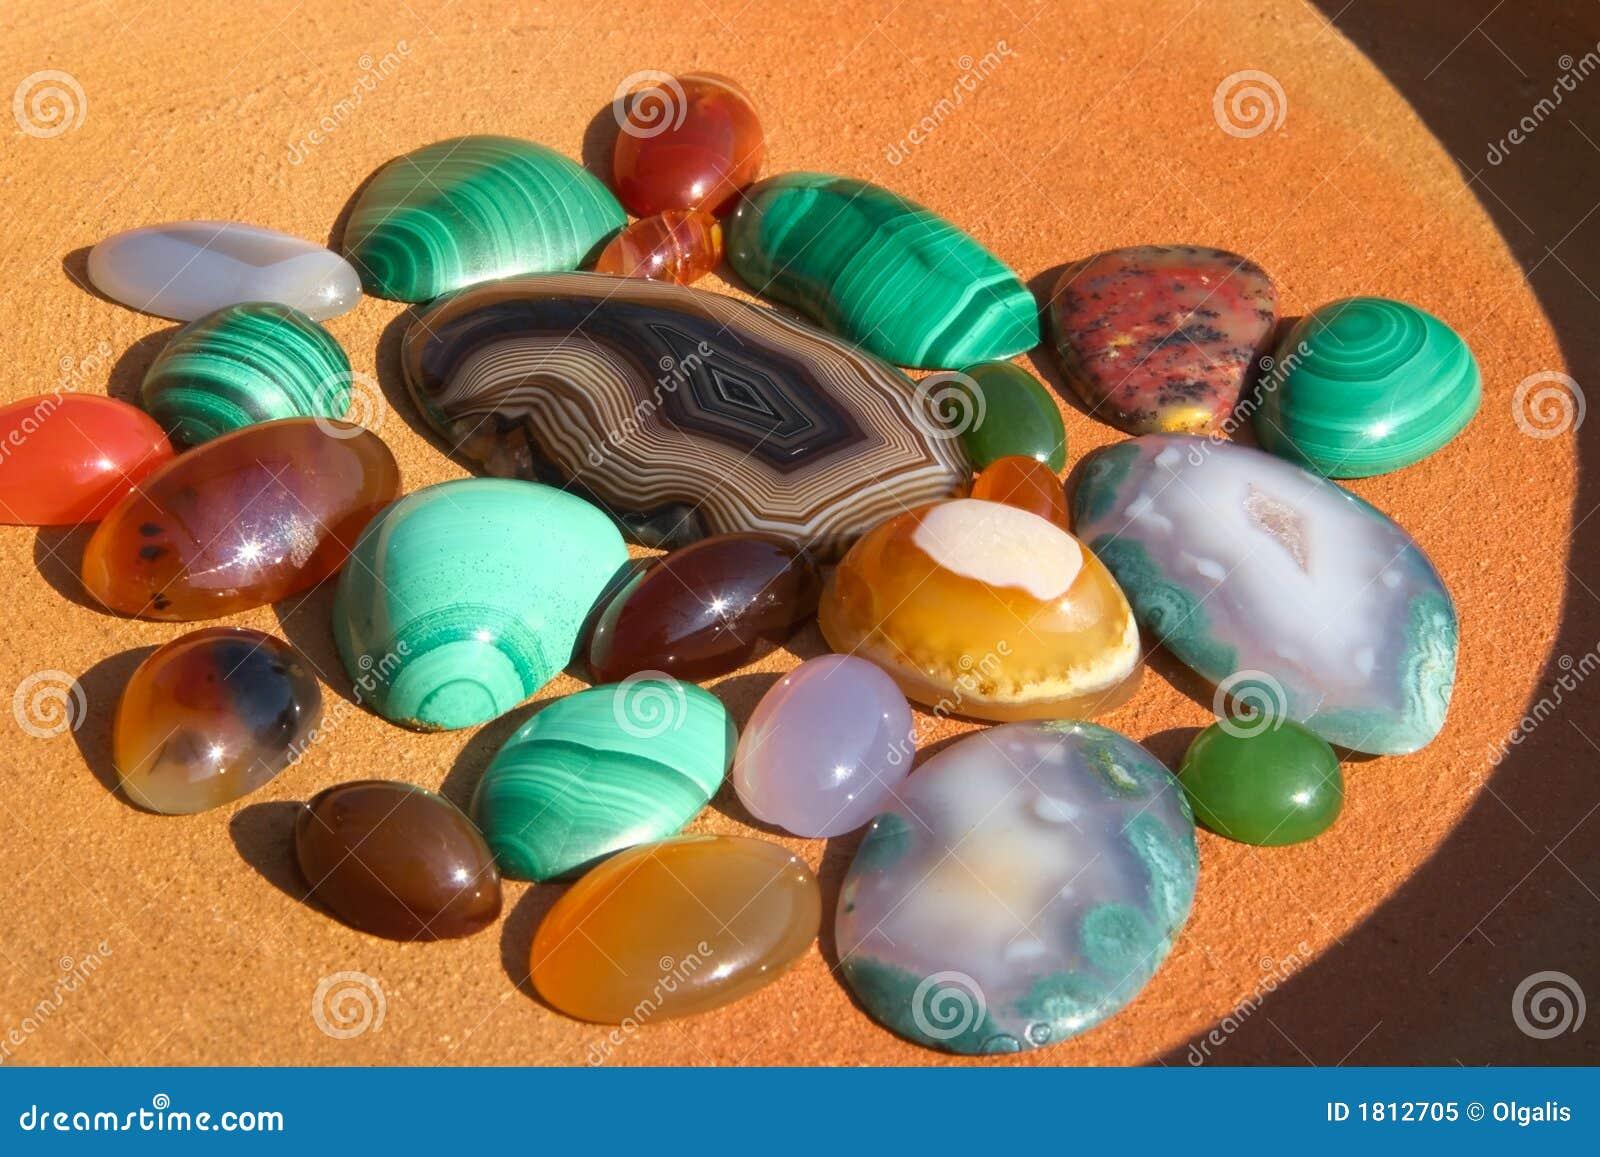 Colourful Semiprecious Stones Background Stock Image - Image of ...